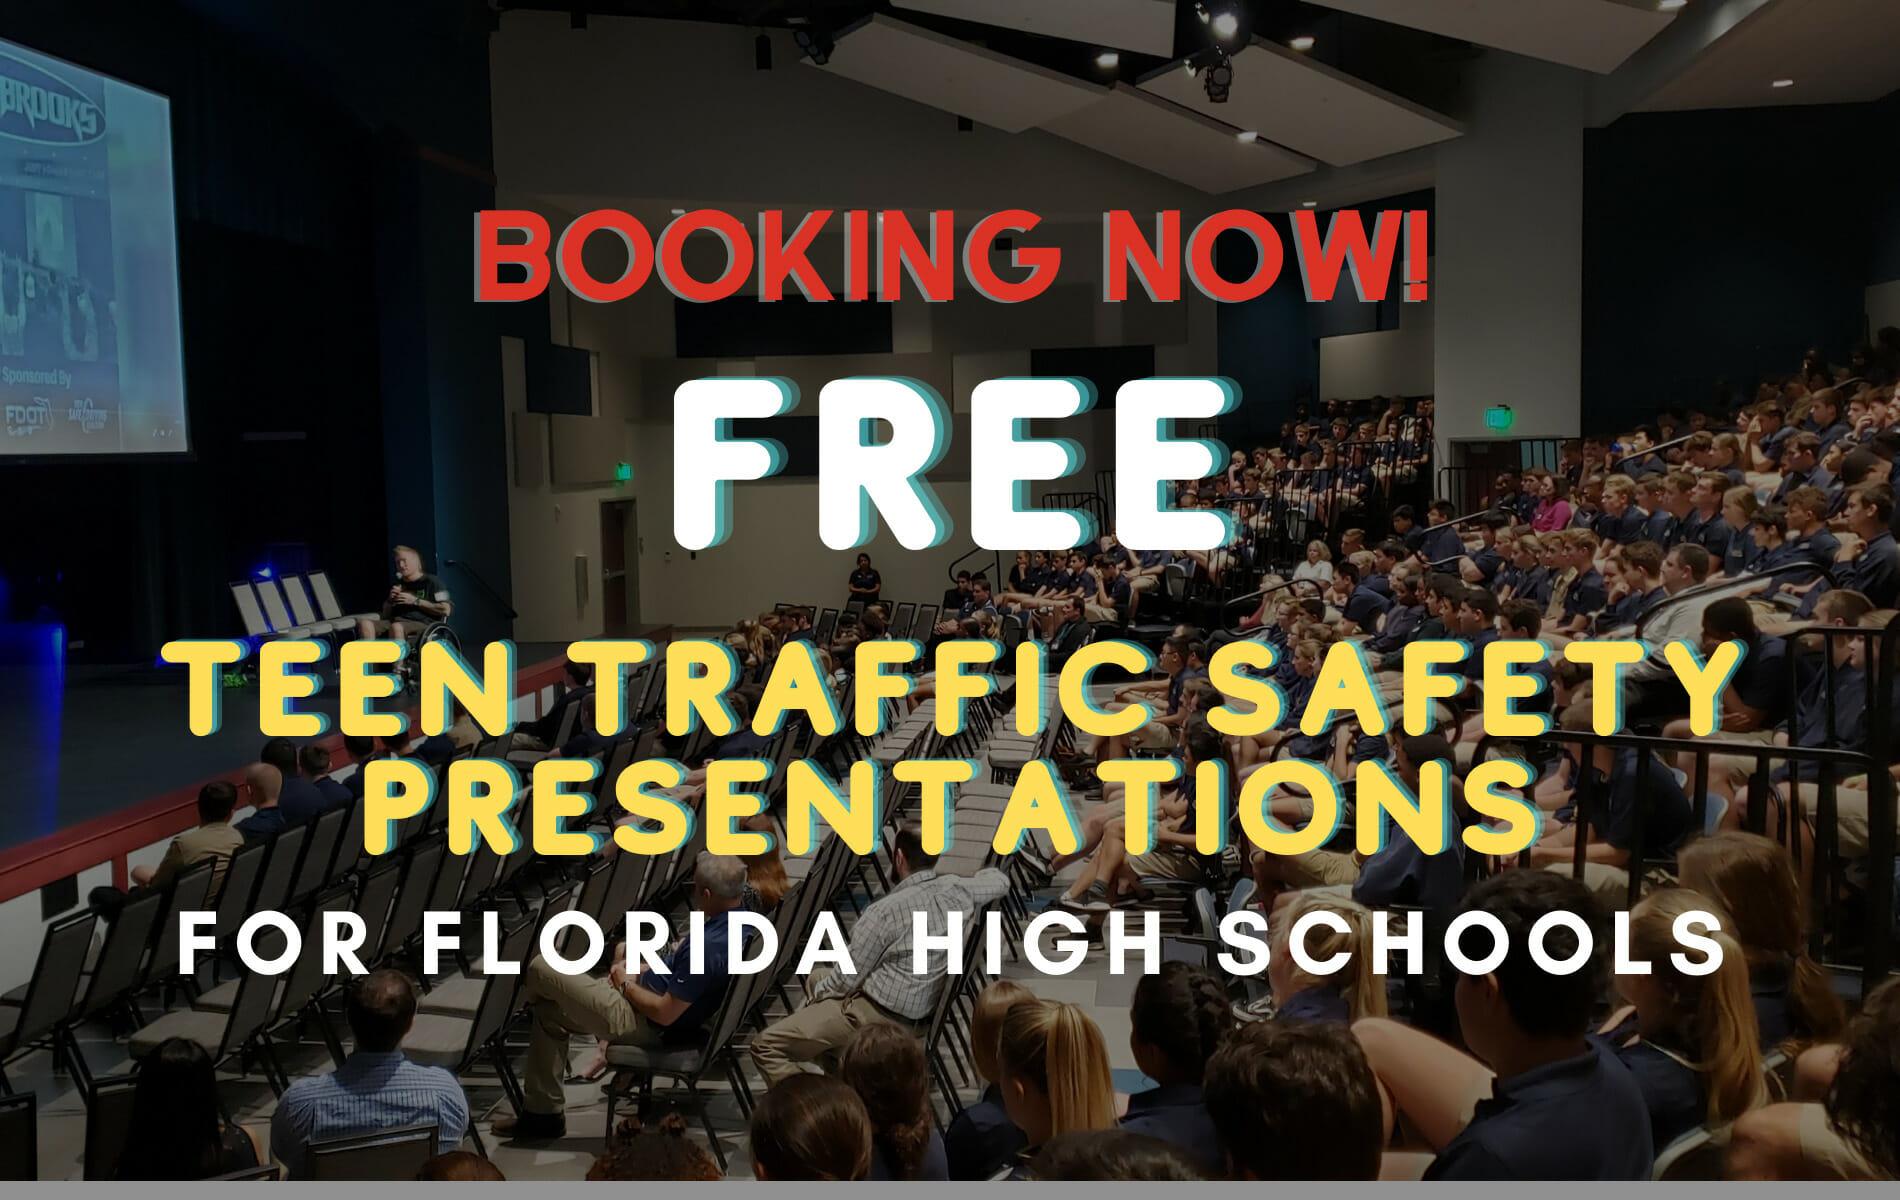 FREE Teen Traffic Safety Presentations for Florida High Schools